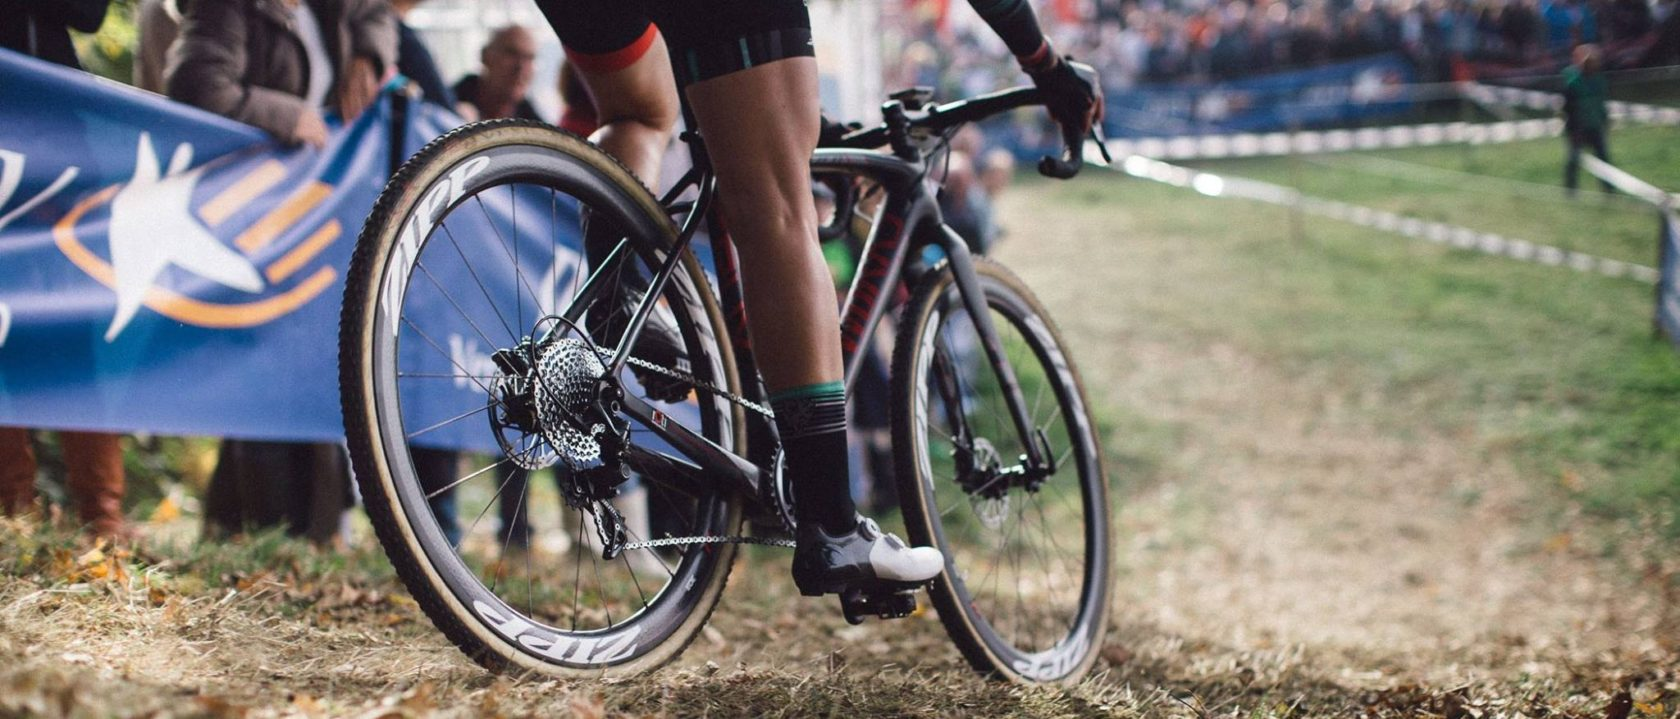 Northern California Nevada Cycling Association